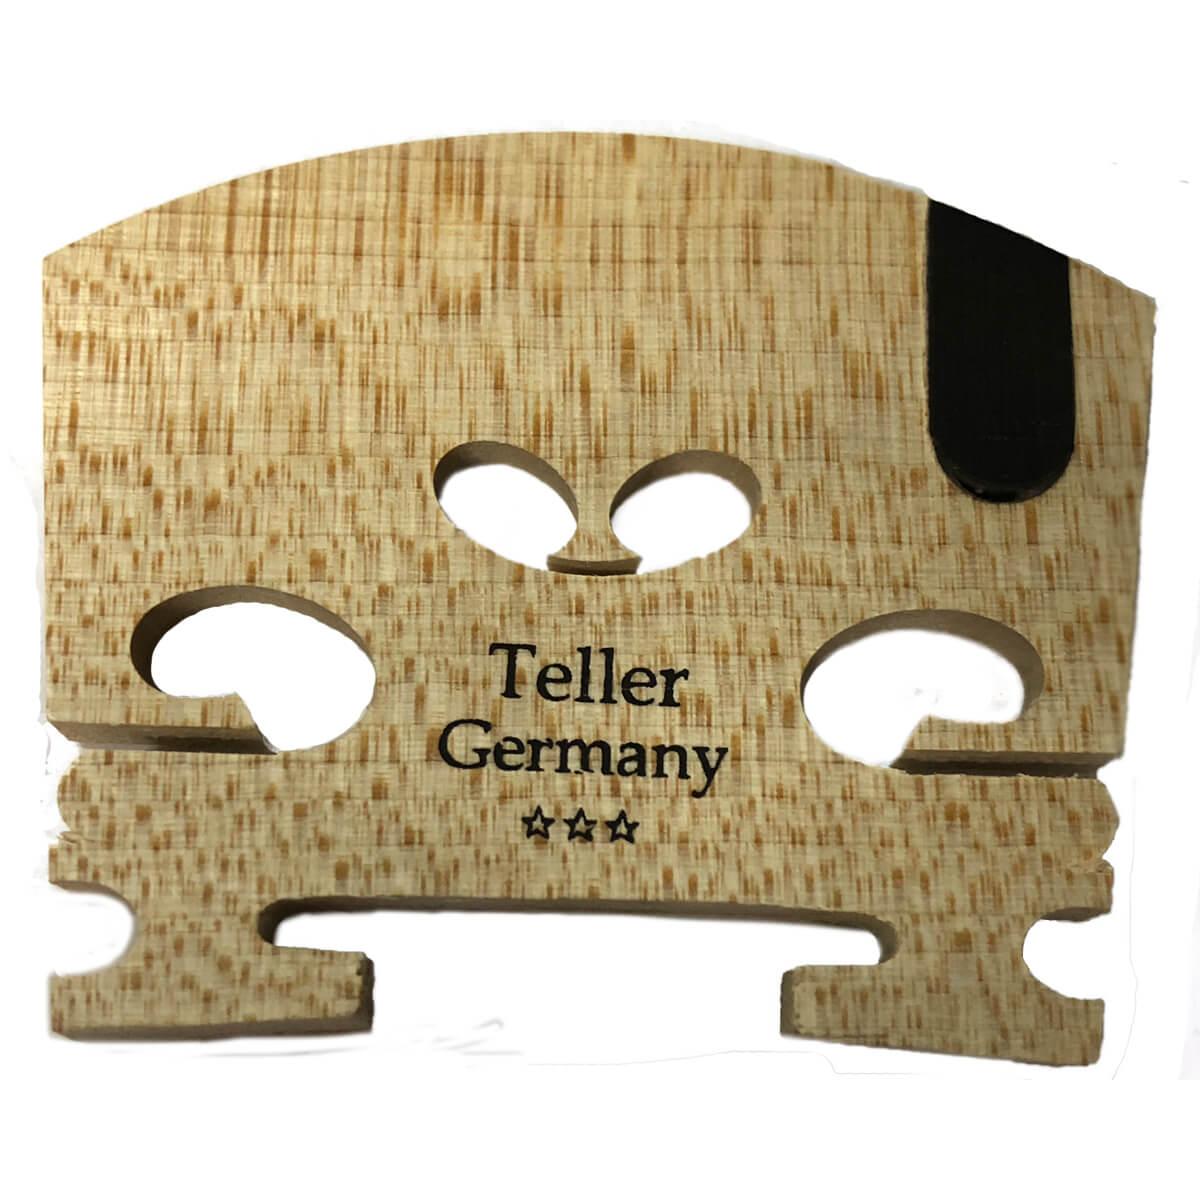 Cavalete Para Violino - 3 Estrelas - Mí Em Ébano - Teller